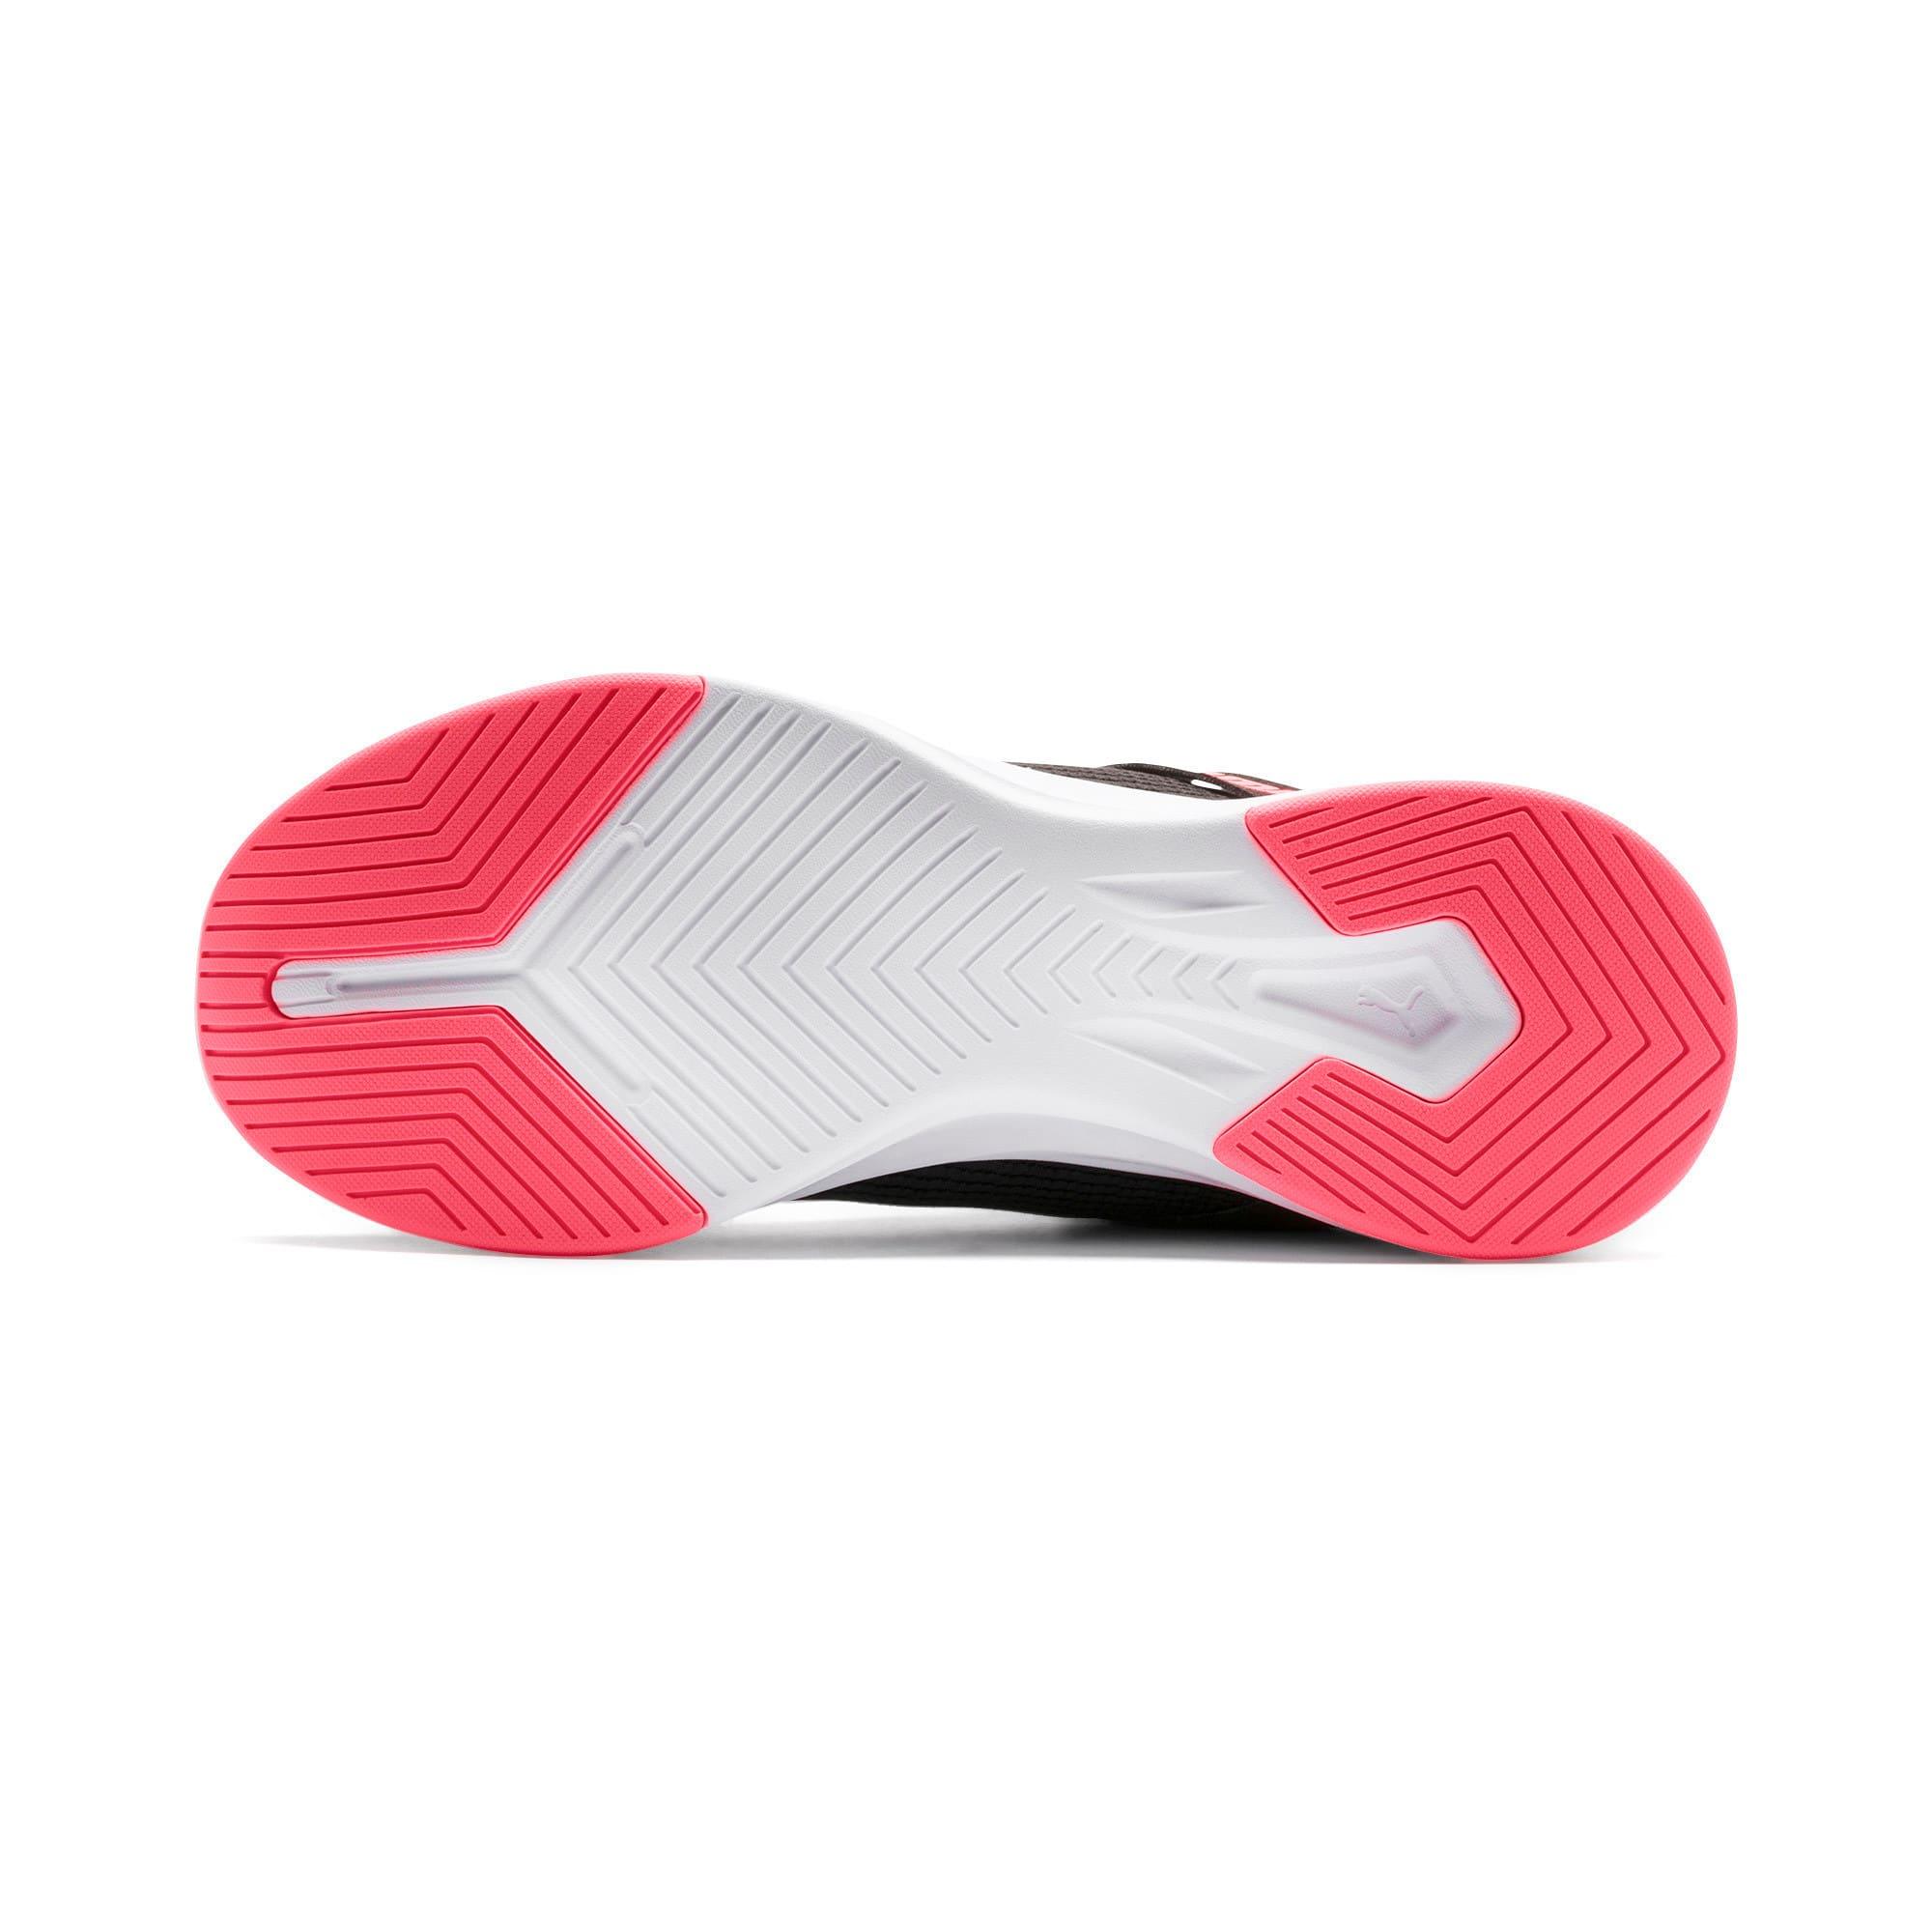 Thumbnail 5 of Radiate XT Women's Training Shoes, Puma Black-Pink Alert, medium